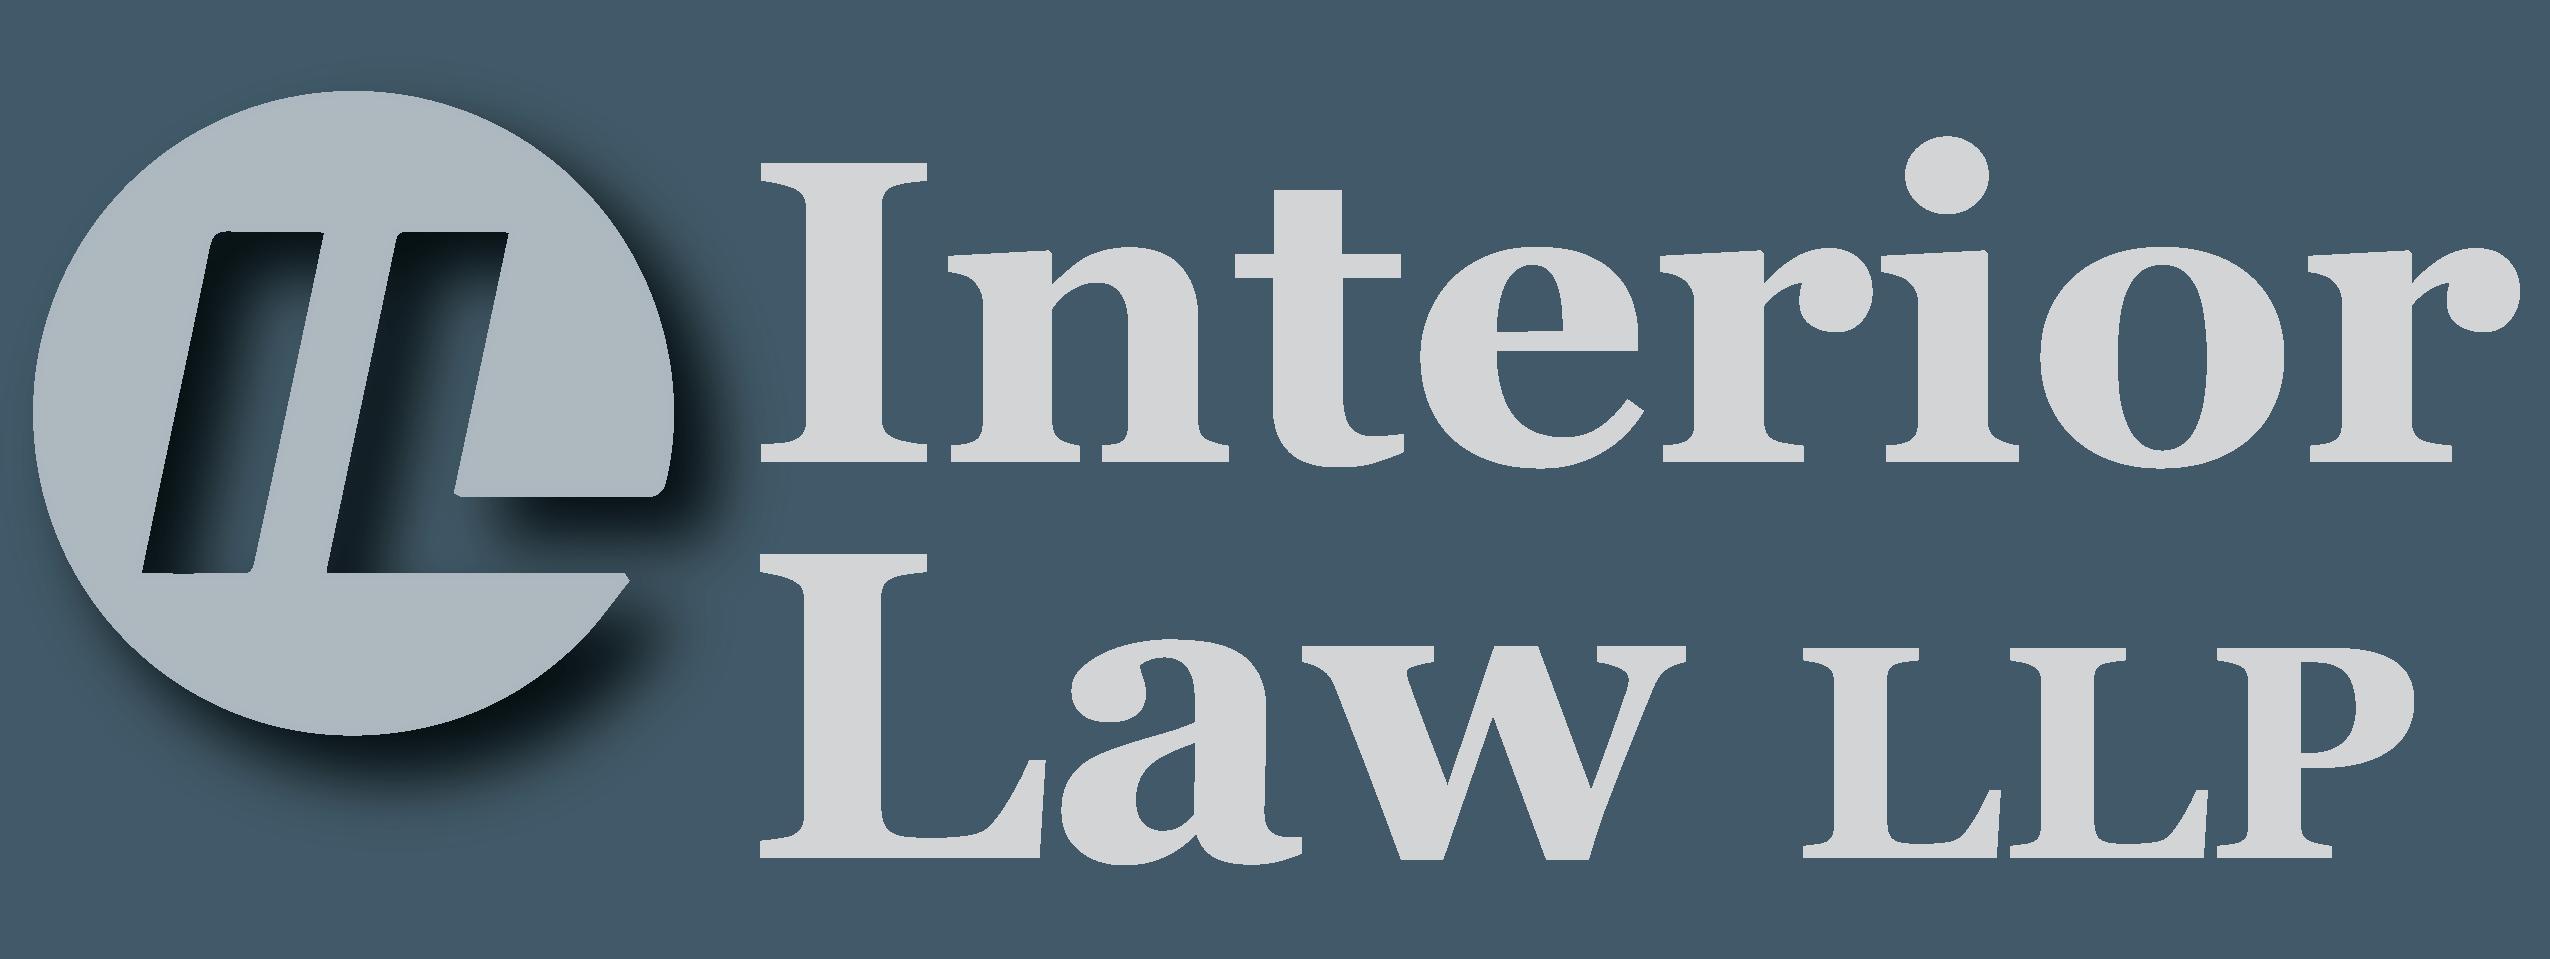 Law firm branding hamilton